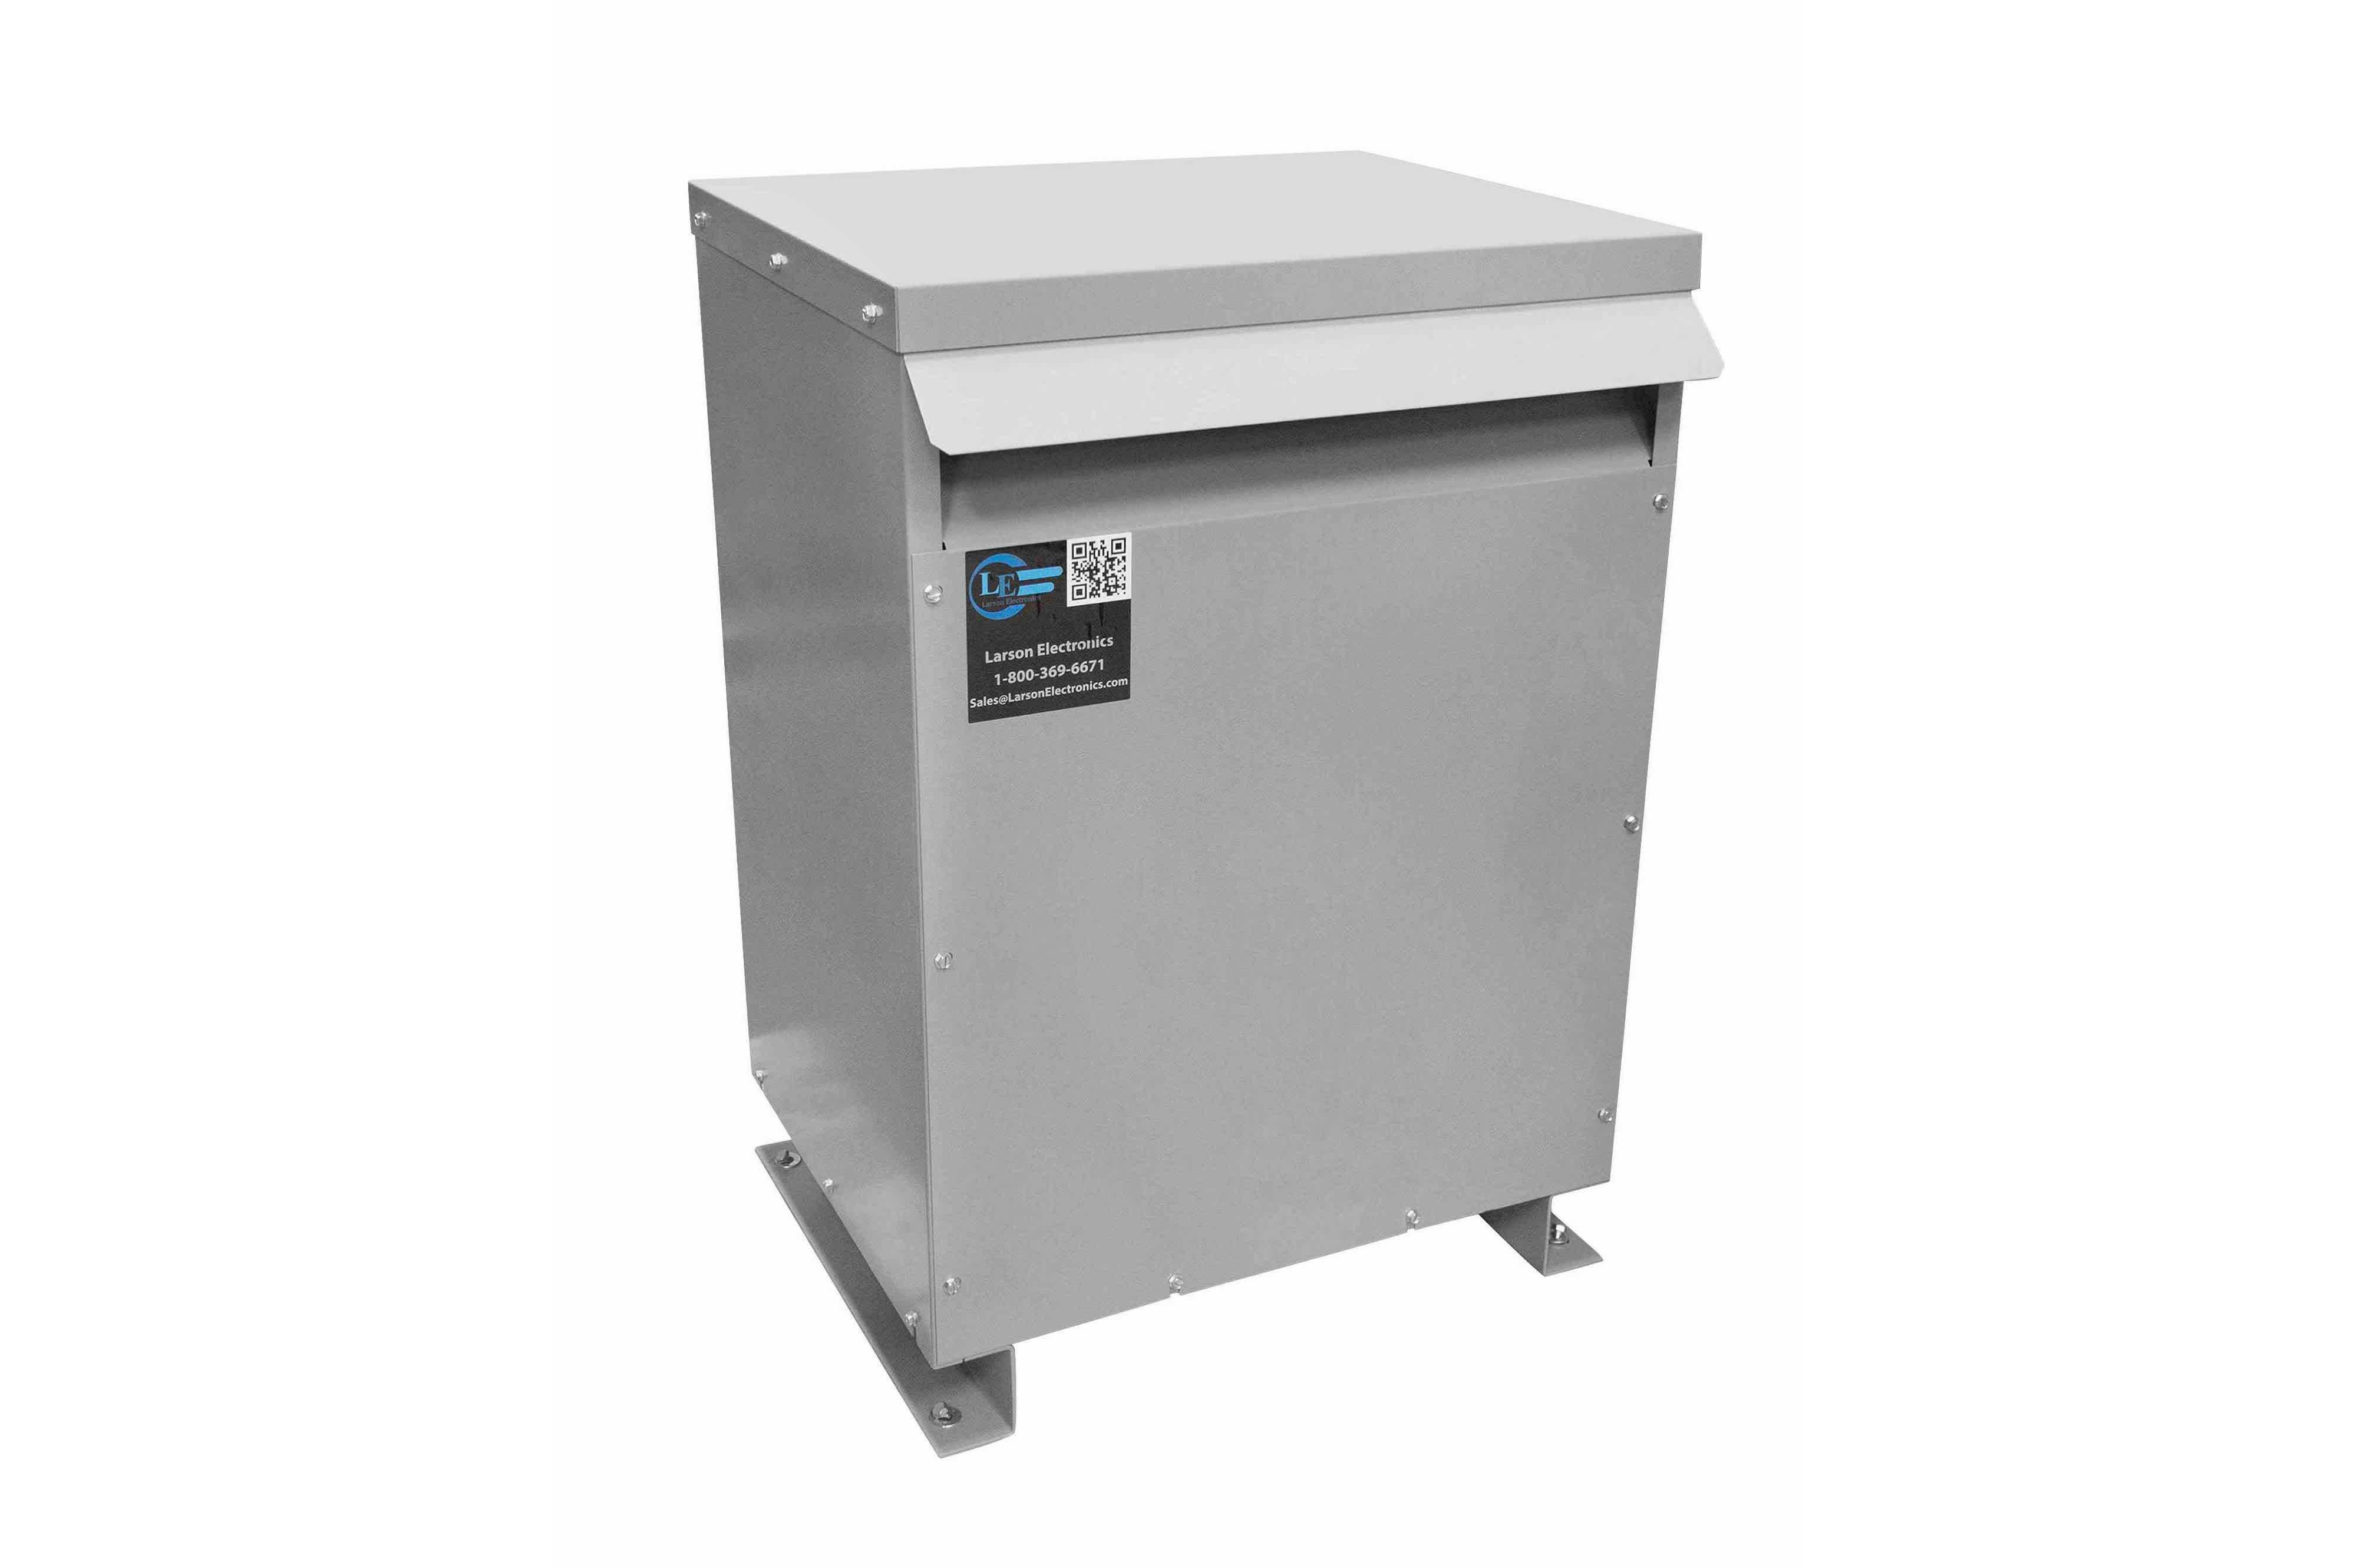 175 kVA 3PH Isolation Transformer, 480V Wye Primary, 380V Delta Secondary, N3R, Ventilated, 60 Hz